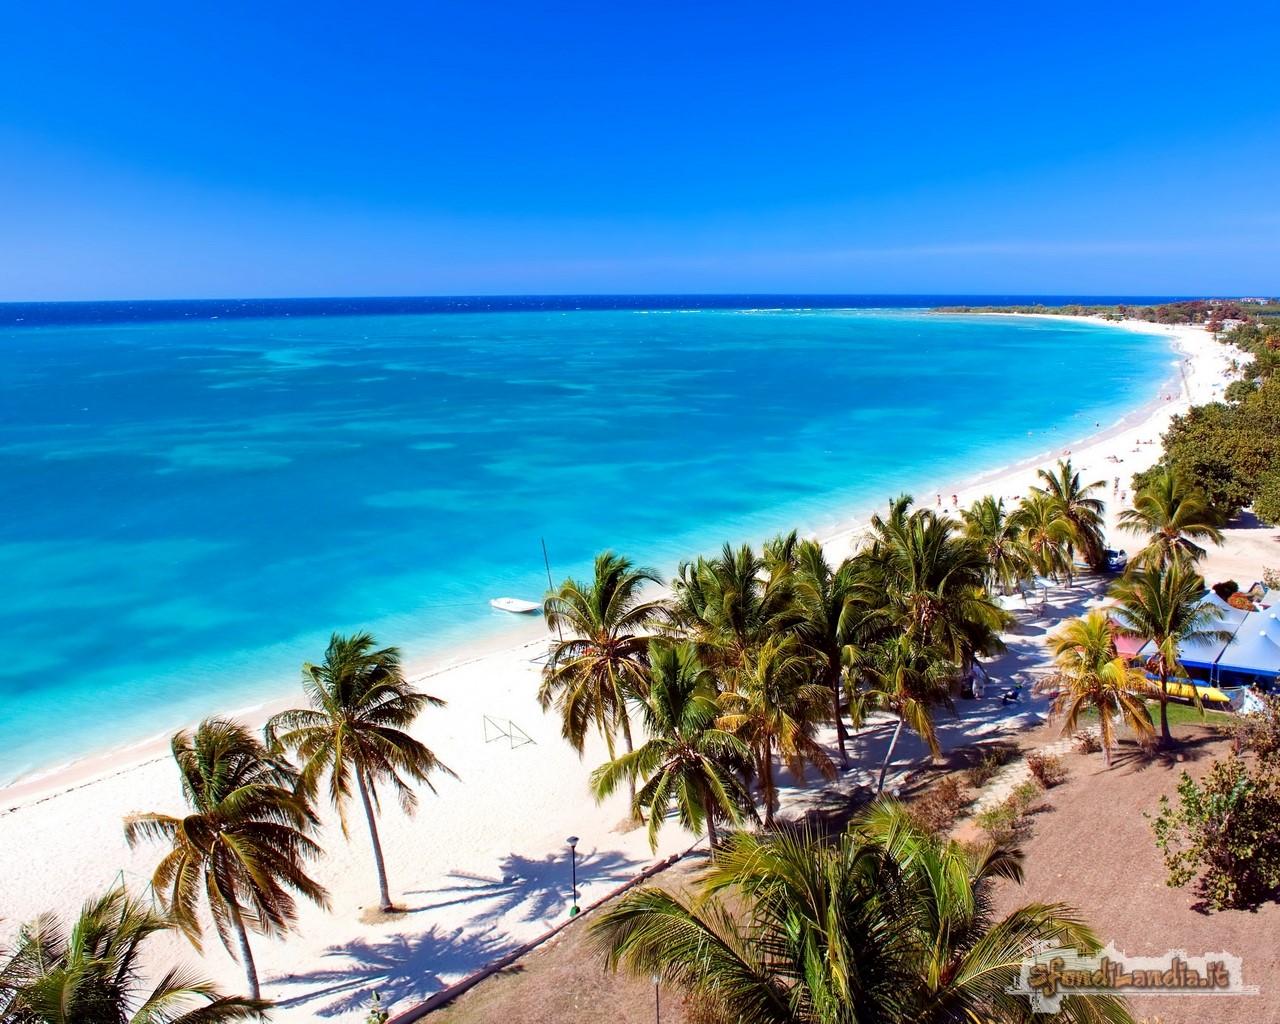 Spiaggia cubana